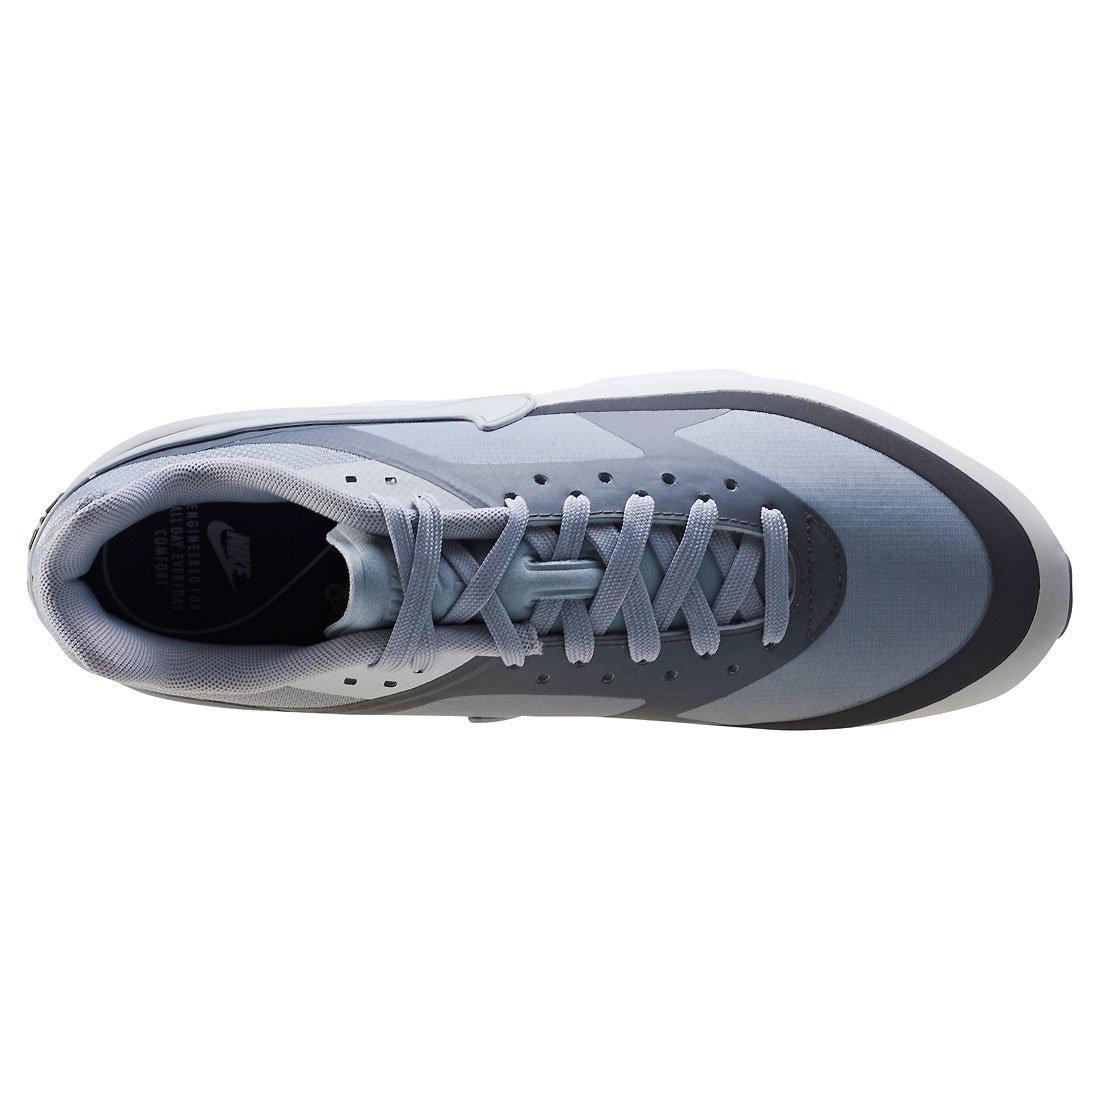 Nike Air Max BW Ultra Sneaker Scarpe per Uomo, BluNero, 47